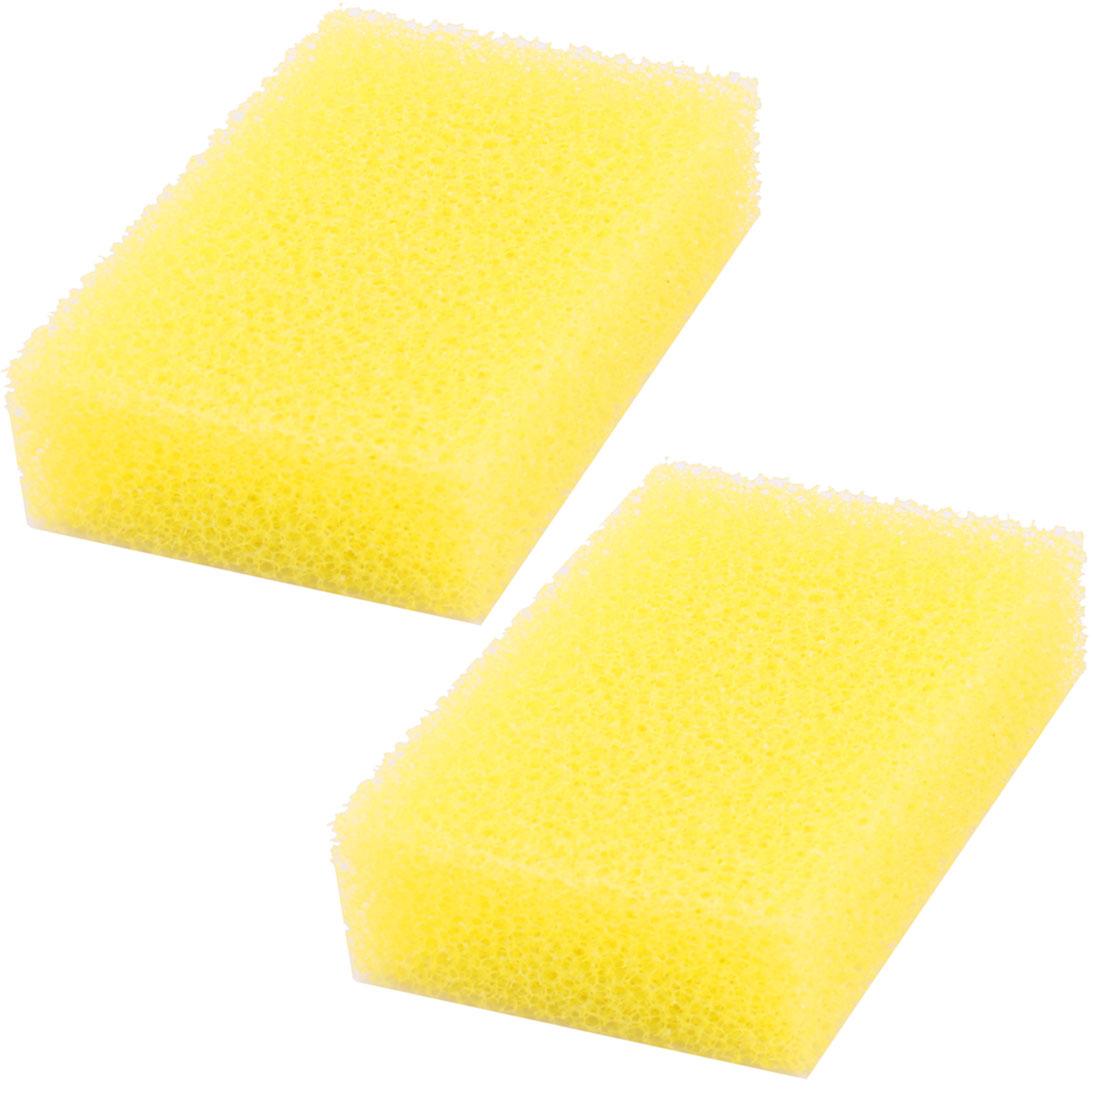 Home Kitchen Picnic Sponge Dish Bowl Plate Pan Pot Cleaning Washing Pad Yellow 2pcs